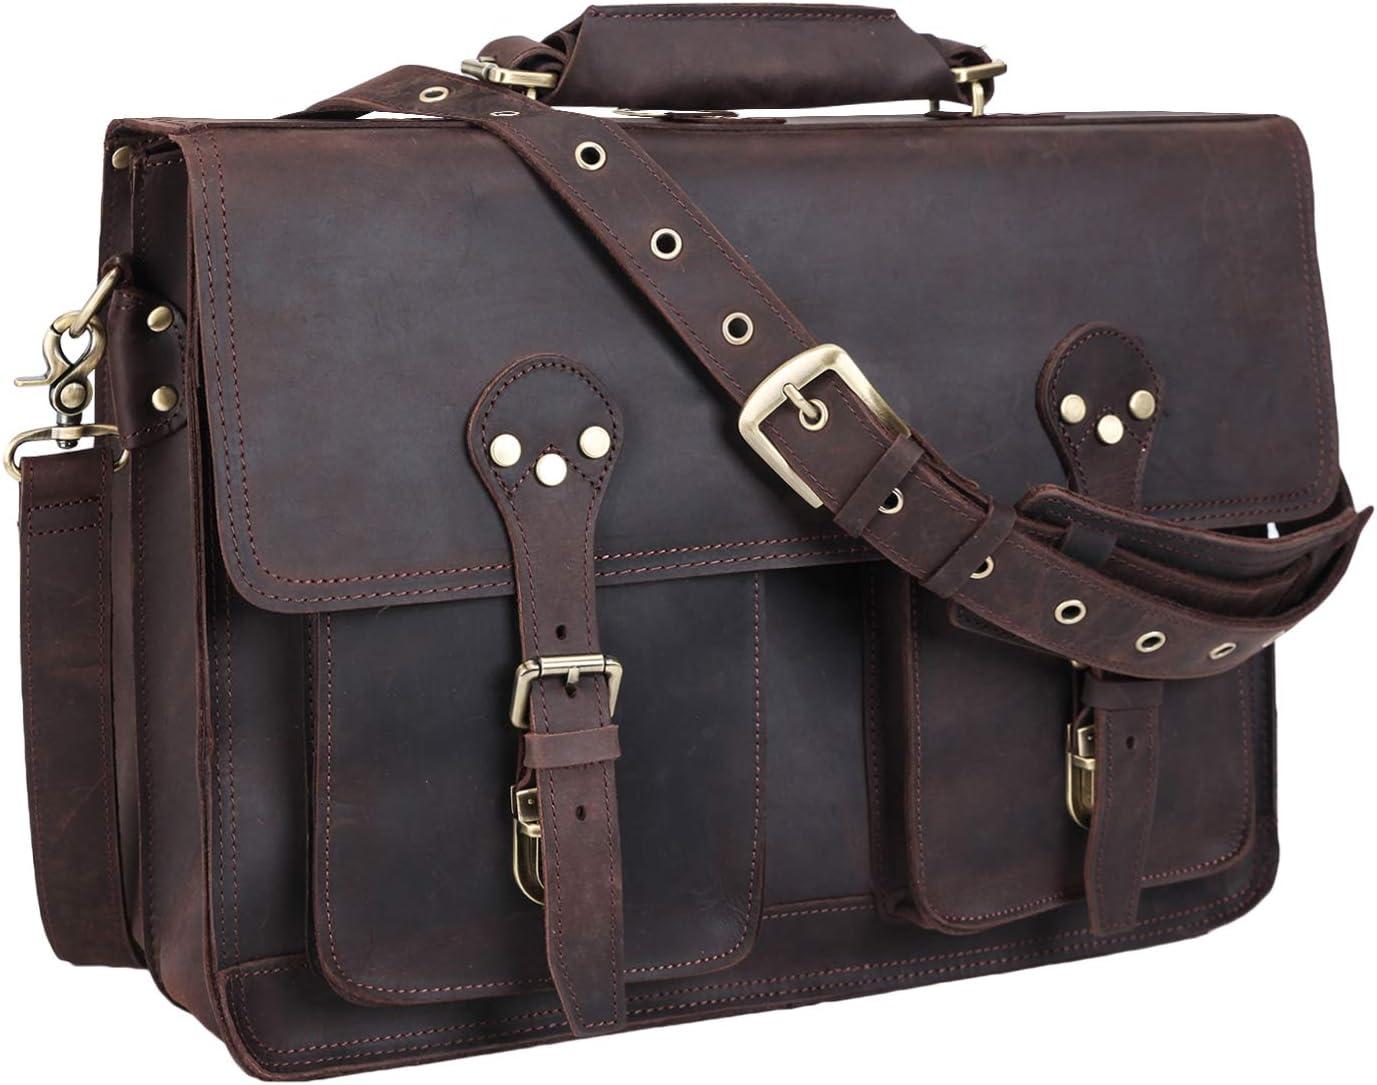 Texbo Men s 16 Inch Genuine Leather Satchel Laptop Briefcase Messenger Bag Tote